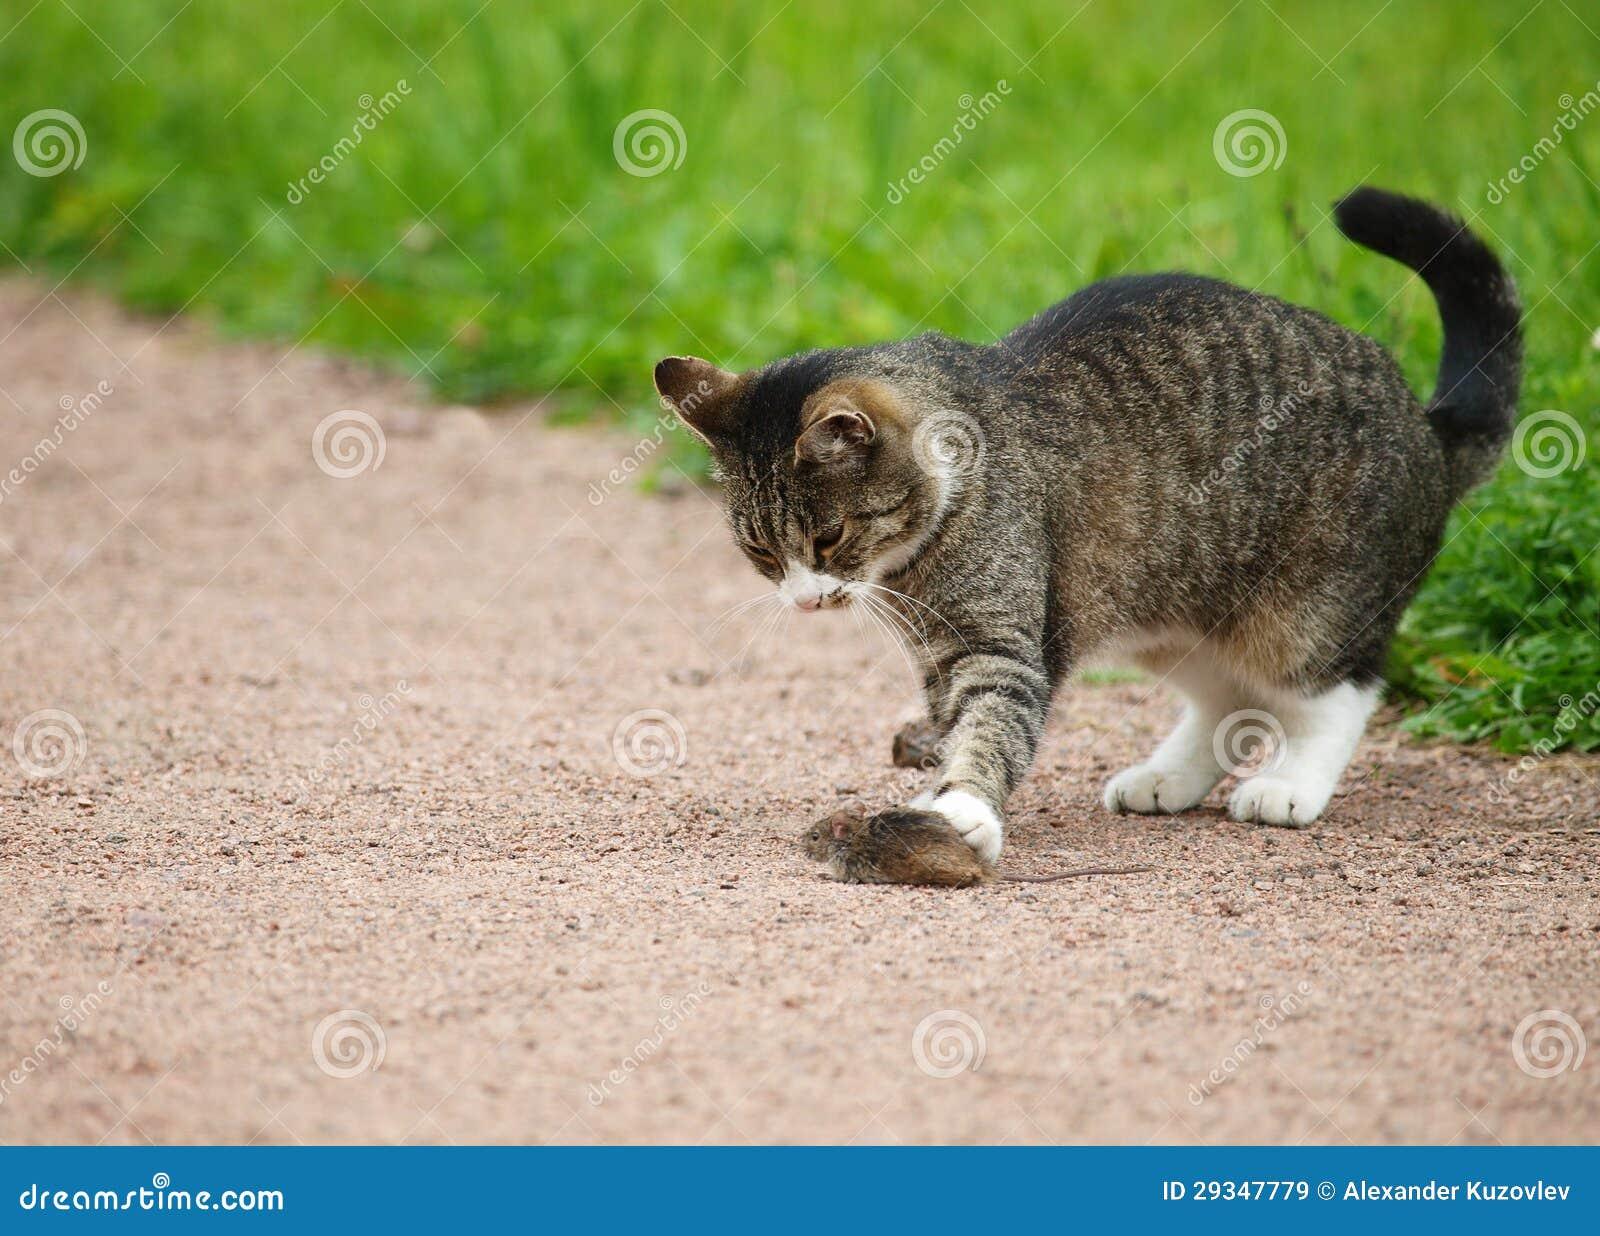 cat hunts mouse stock image image of playing sacrifice 29347779